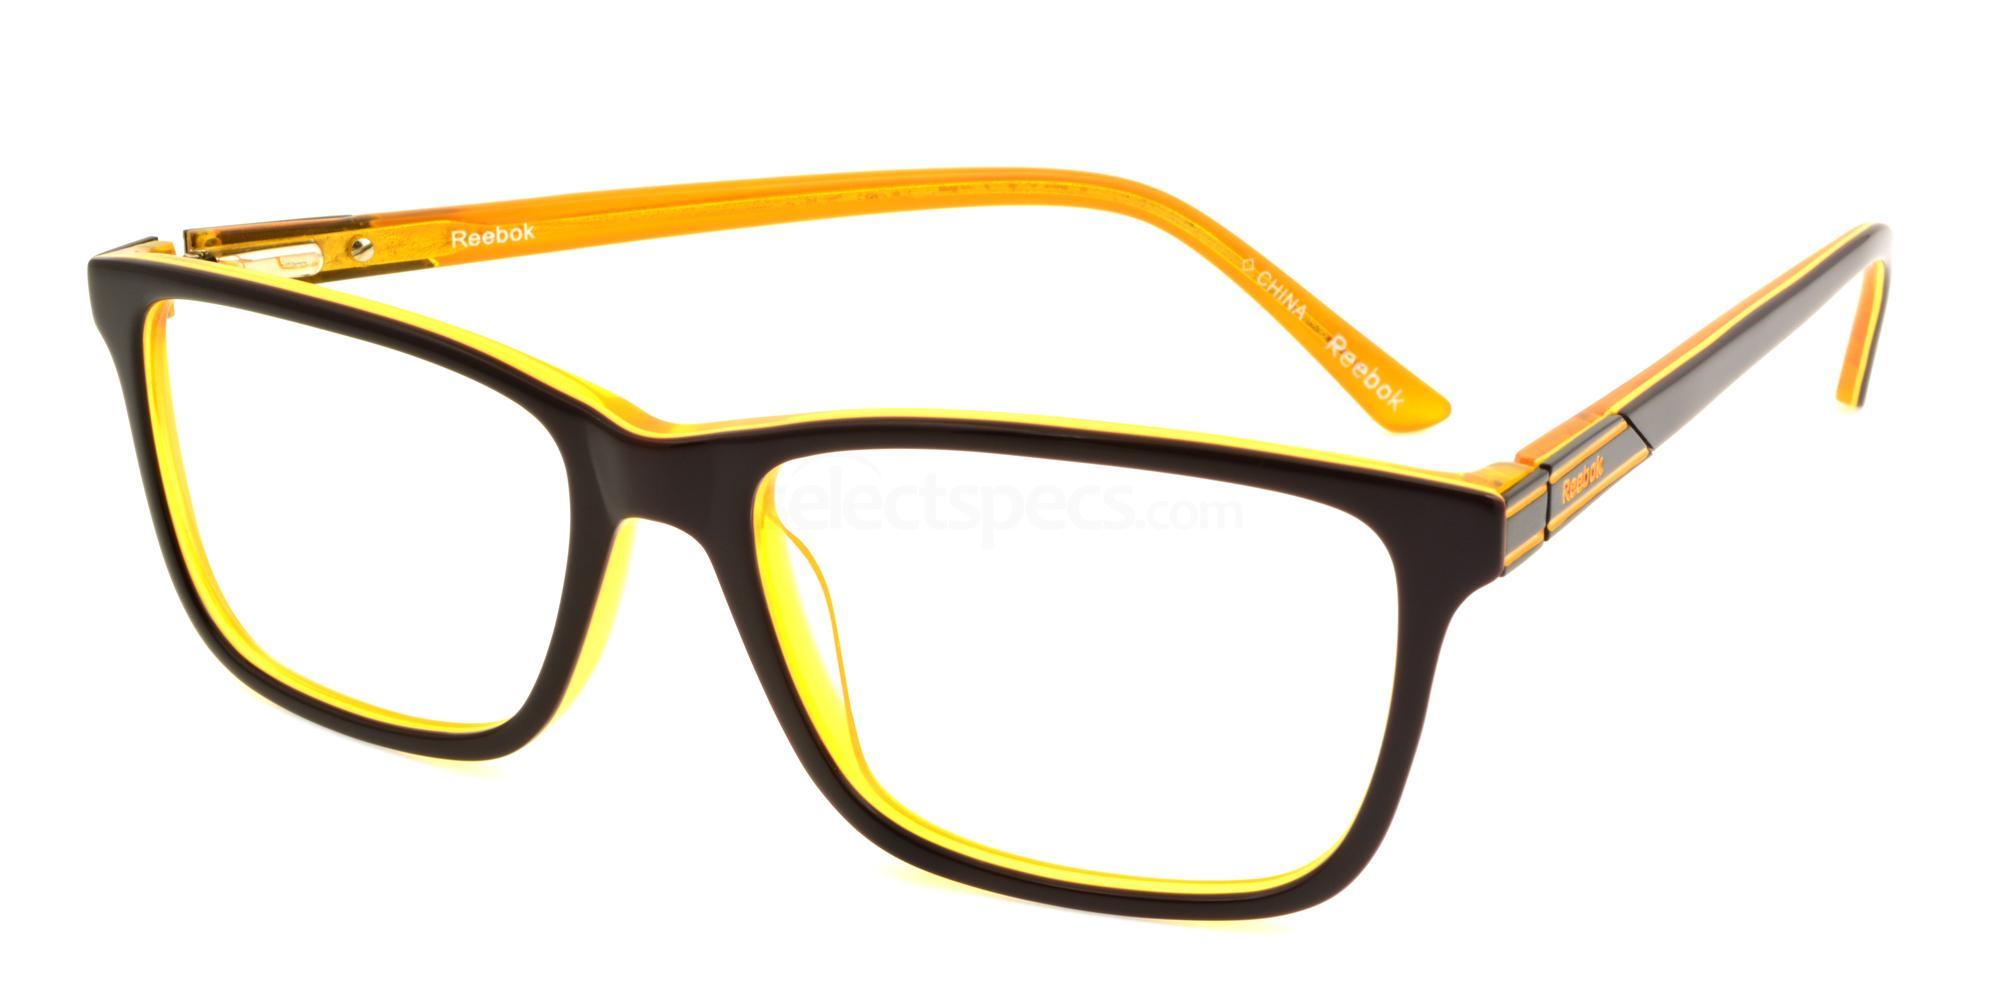 BLO R3007 Glasses, Reebok